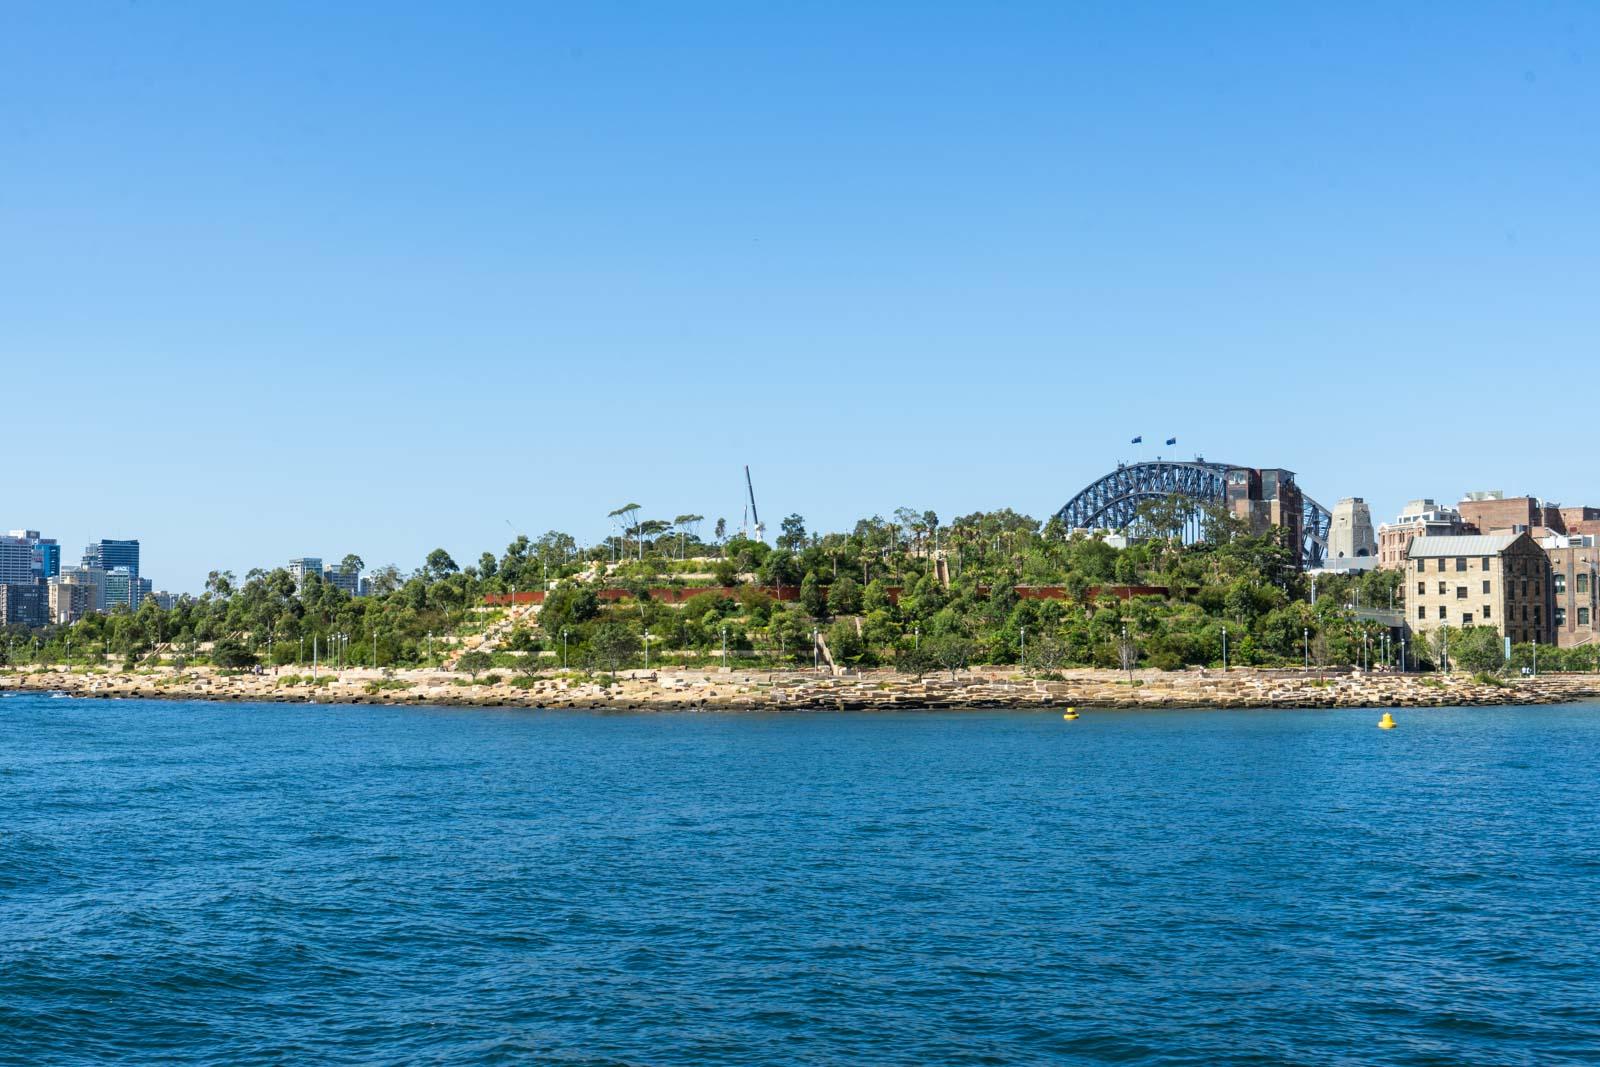 Barangaroo Reserve, Sydney, NSW, Australia